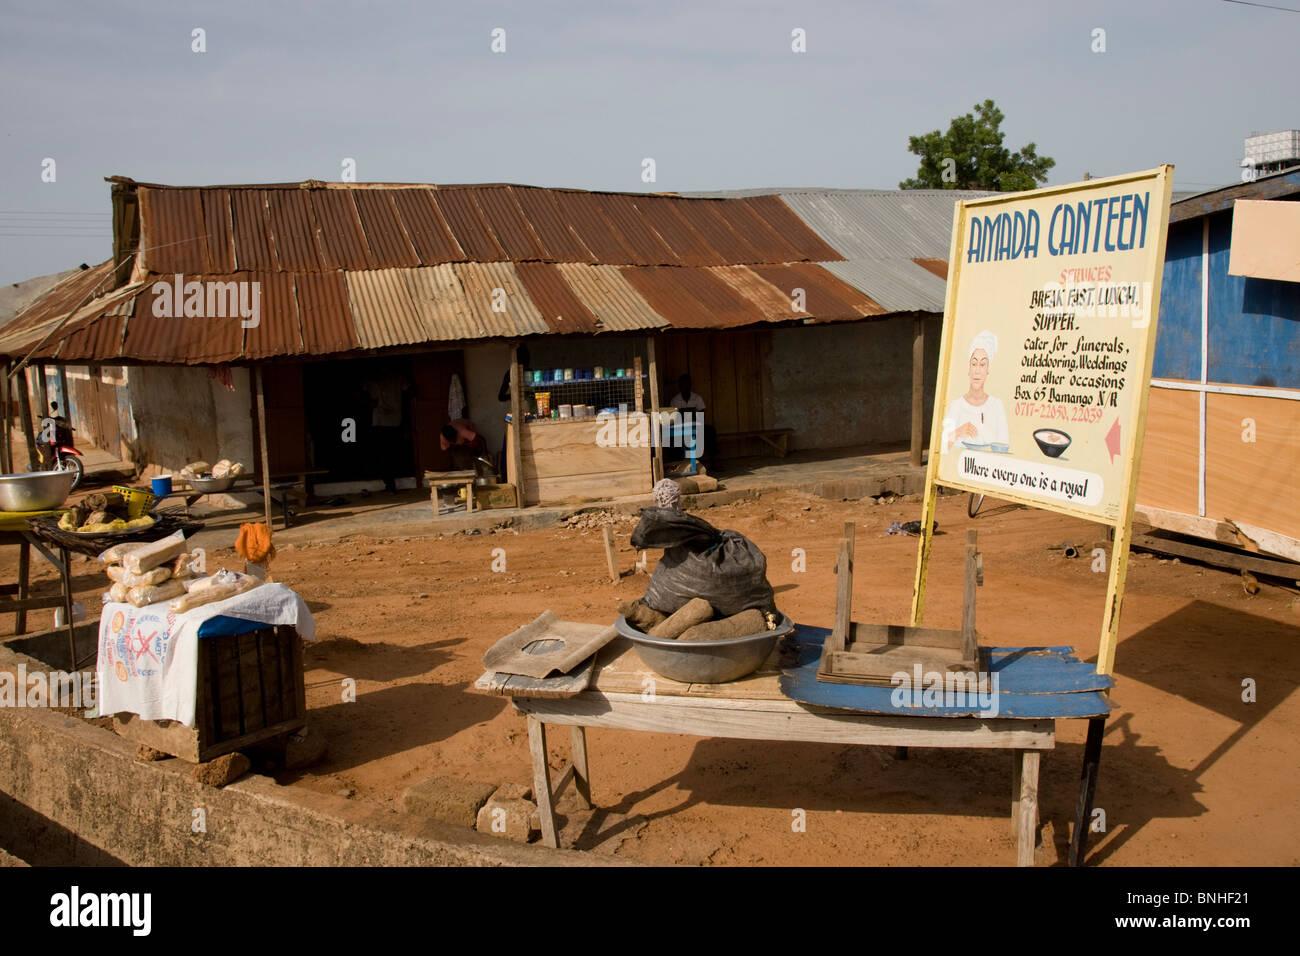 The only restaurant in Damango, northwest Ghana. Stock Photo